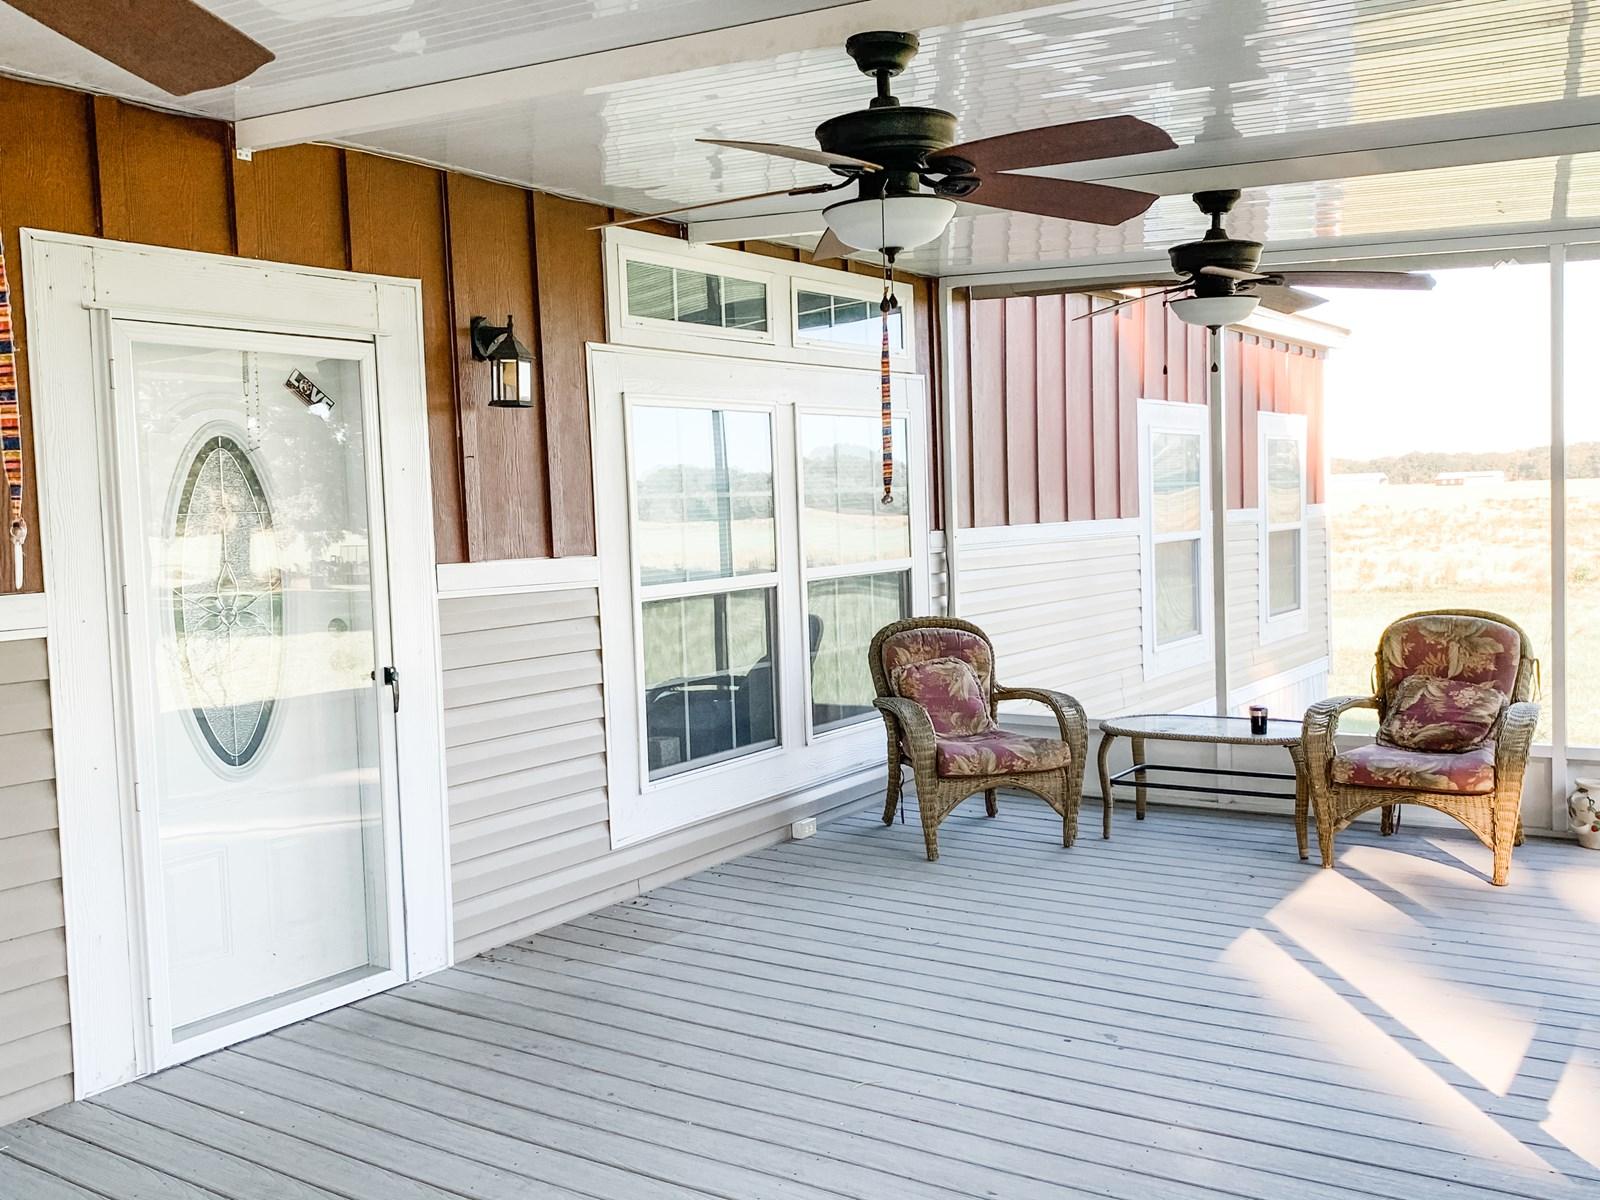 4 Bedroom Home on 5 acres in Live Oak, Florida